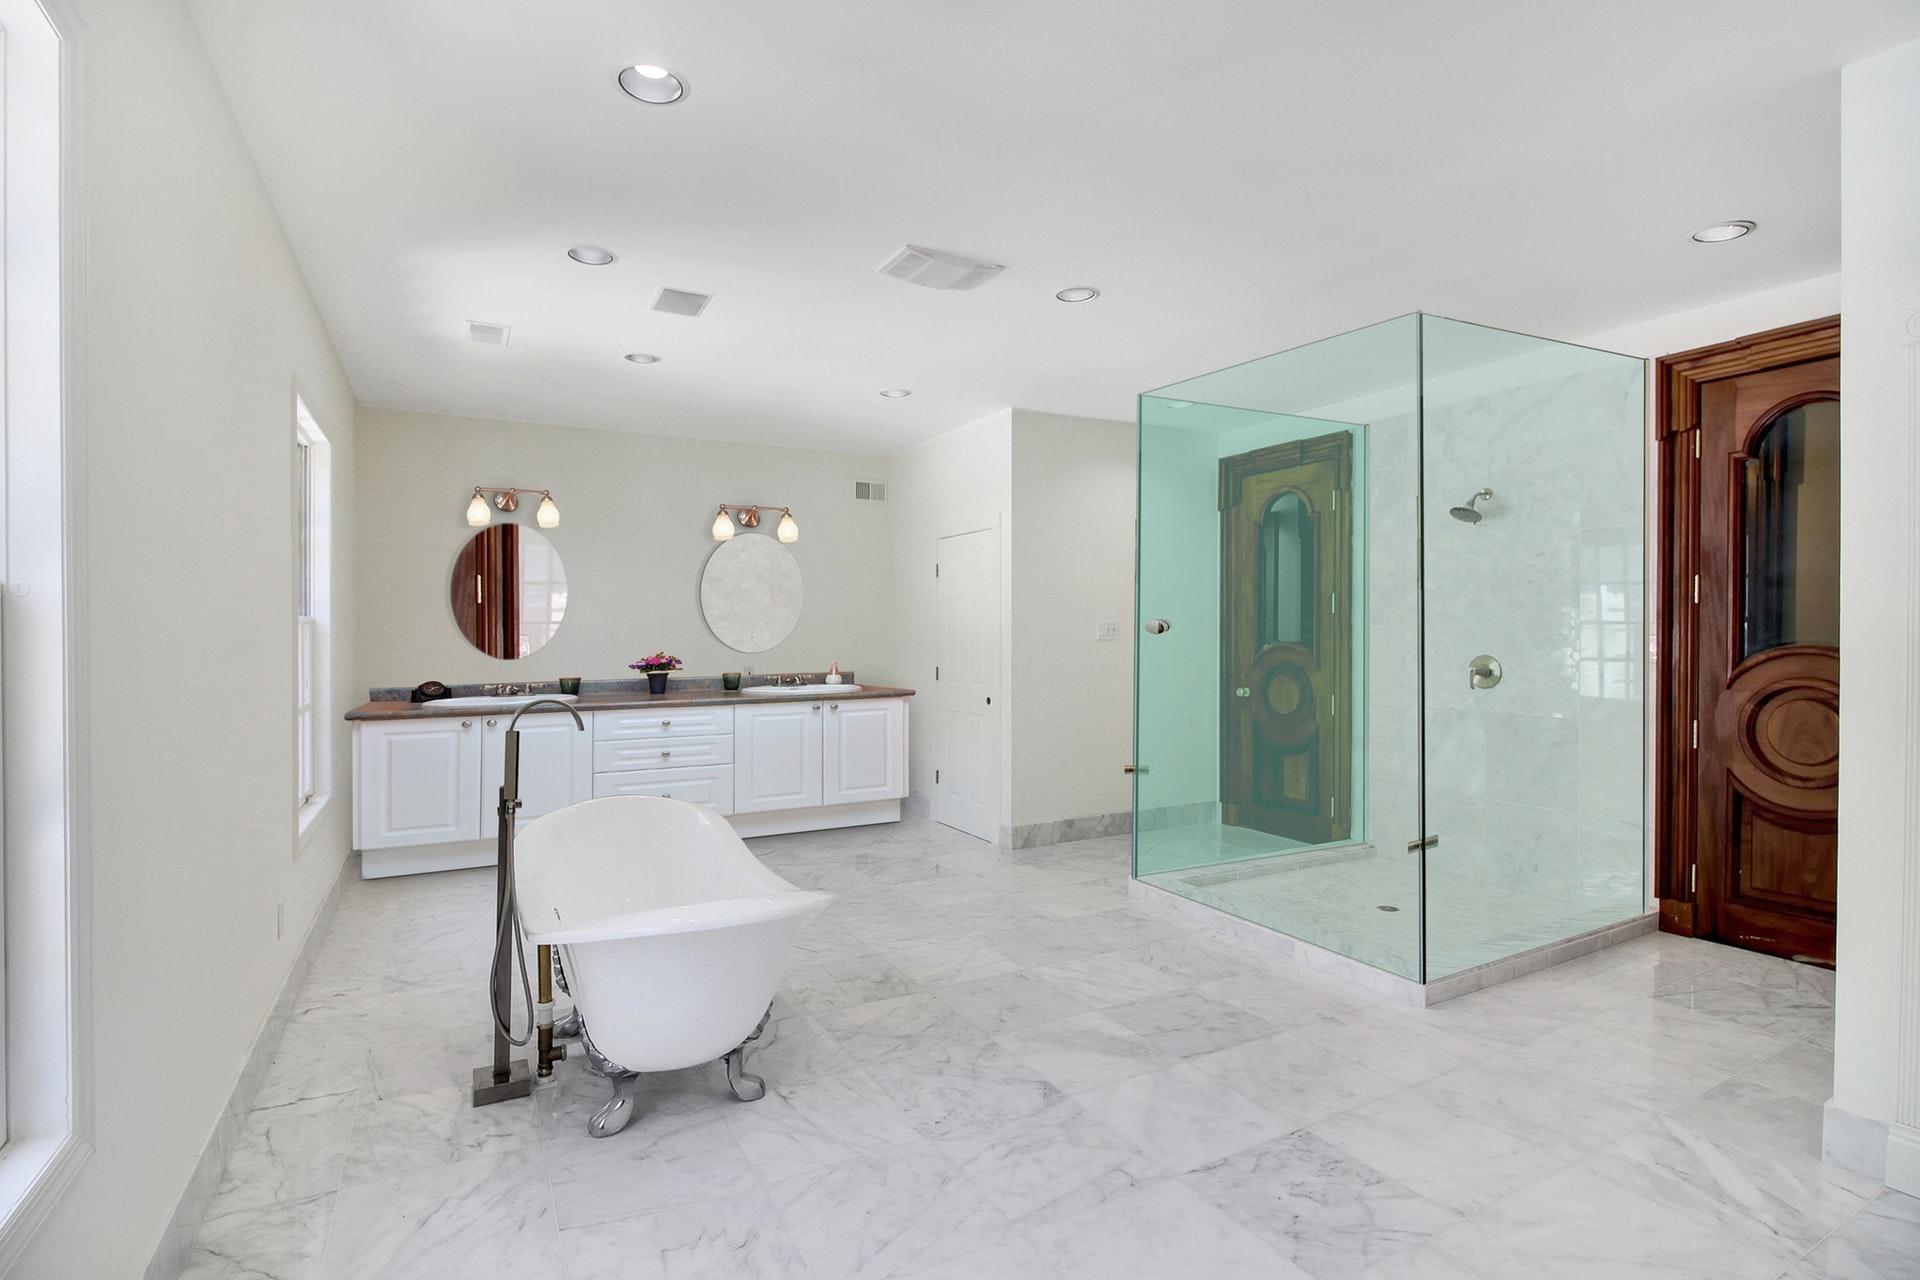 325 South Orange Avenue - Master Bath